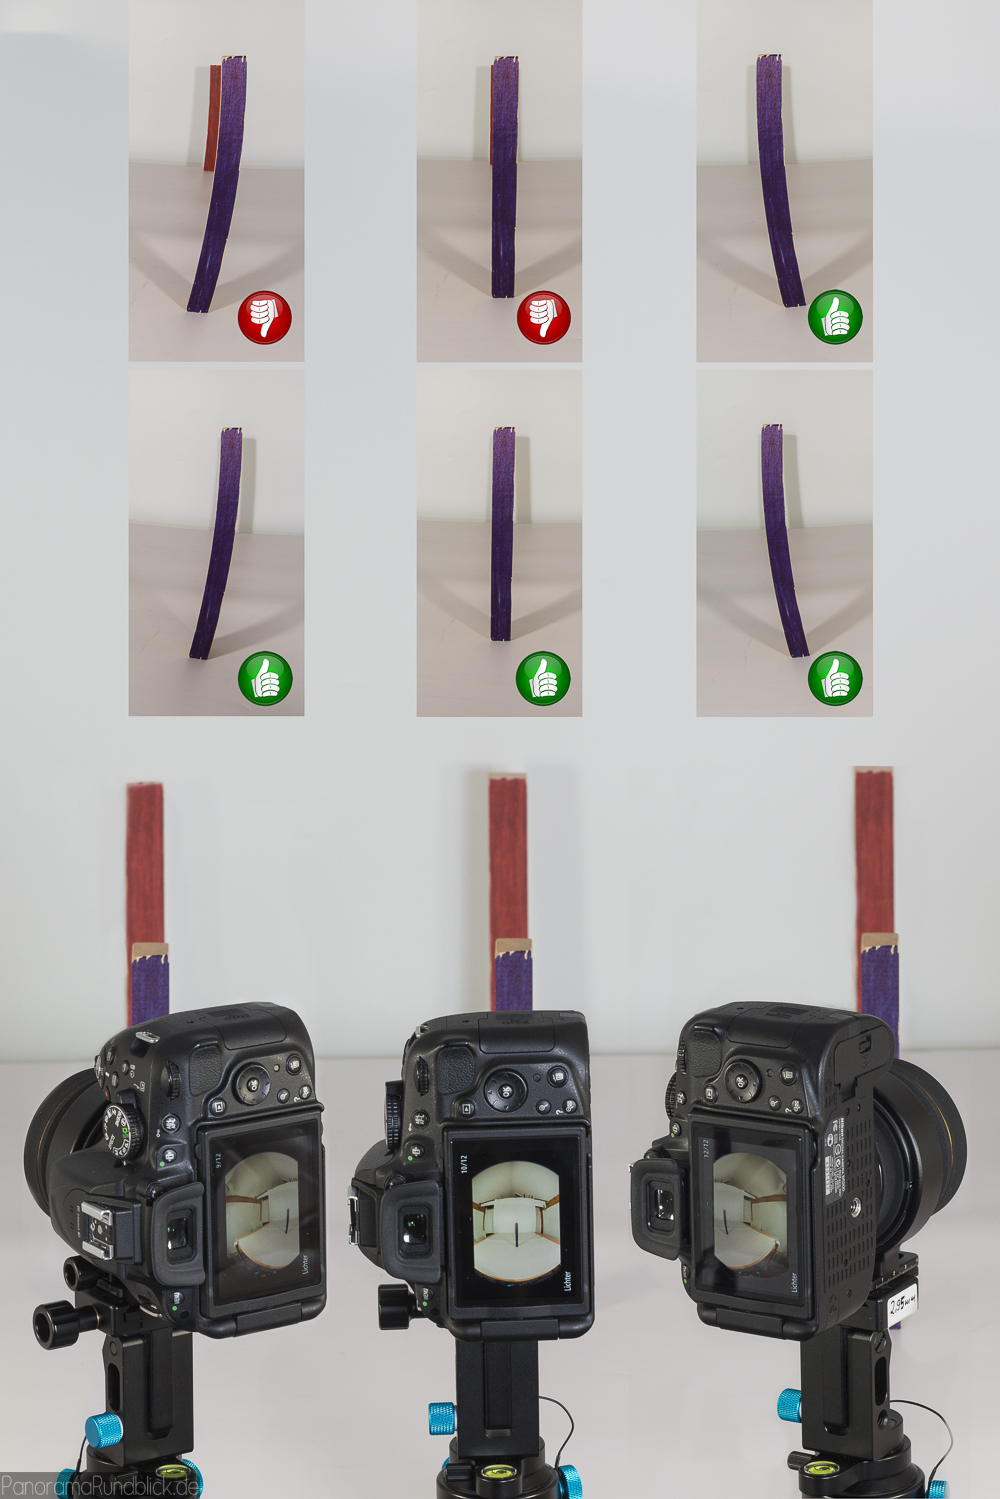 Nodalpunkt-Ermittlung mit NN- Ultimate R10, Sigma 8 mm F3,5 EX DG Zirkular Fisheye-Objektiv